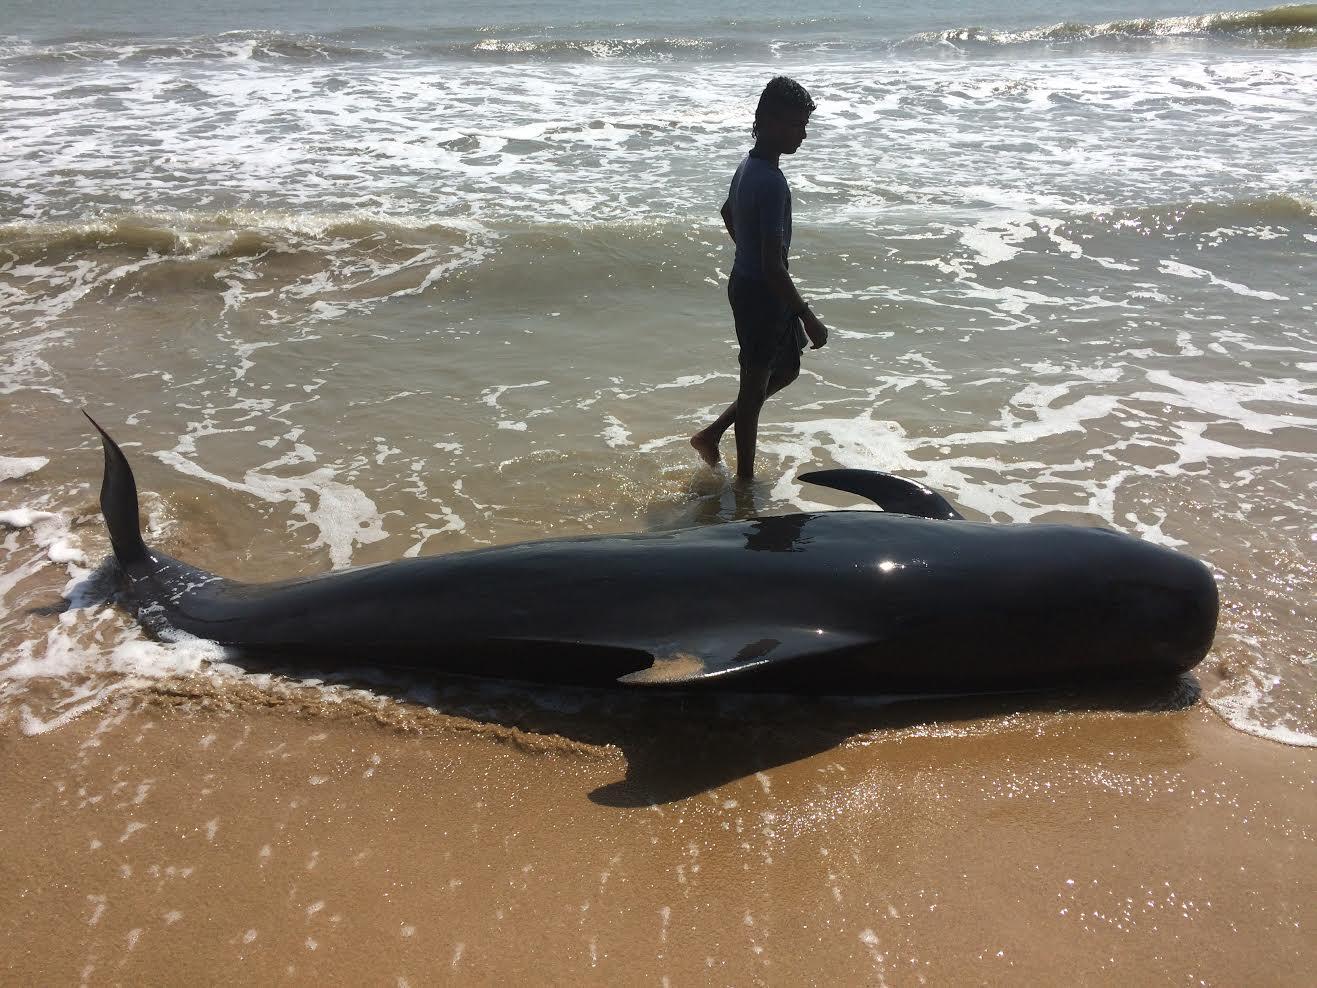 The body of a stranded pilot whale at Kallamozhi. Credit: Saravanakumar